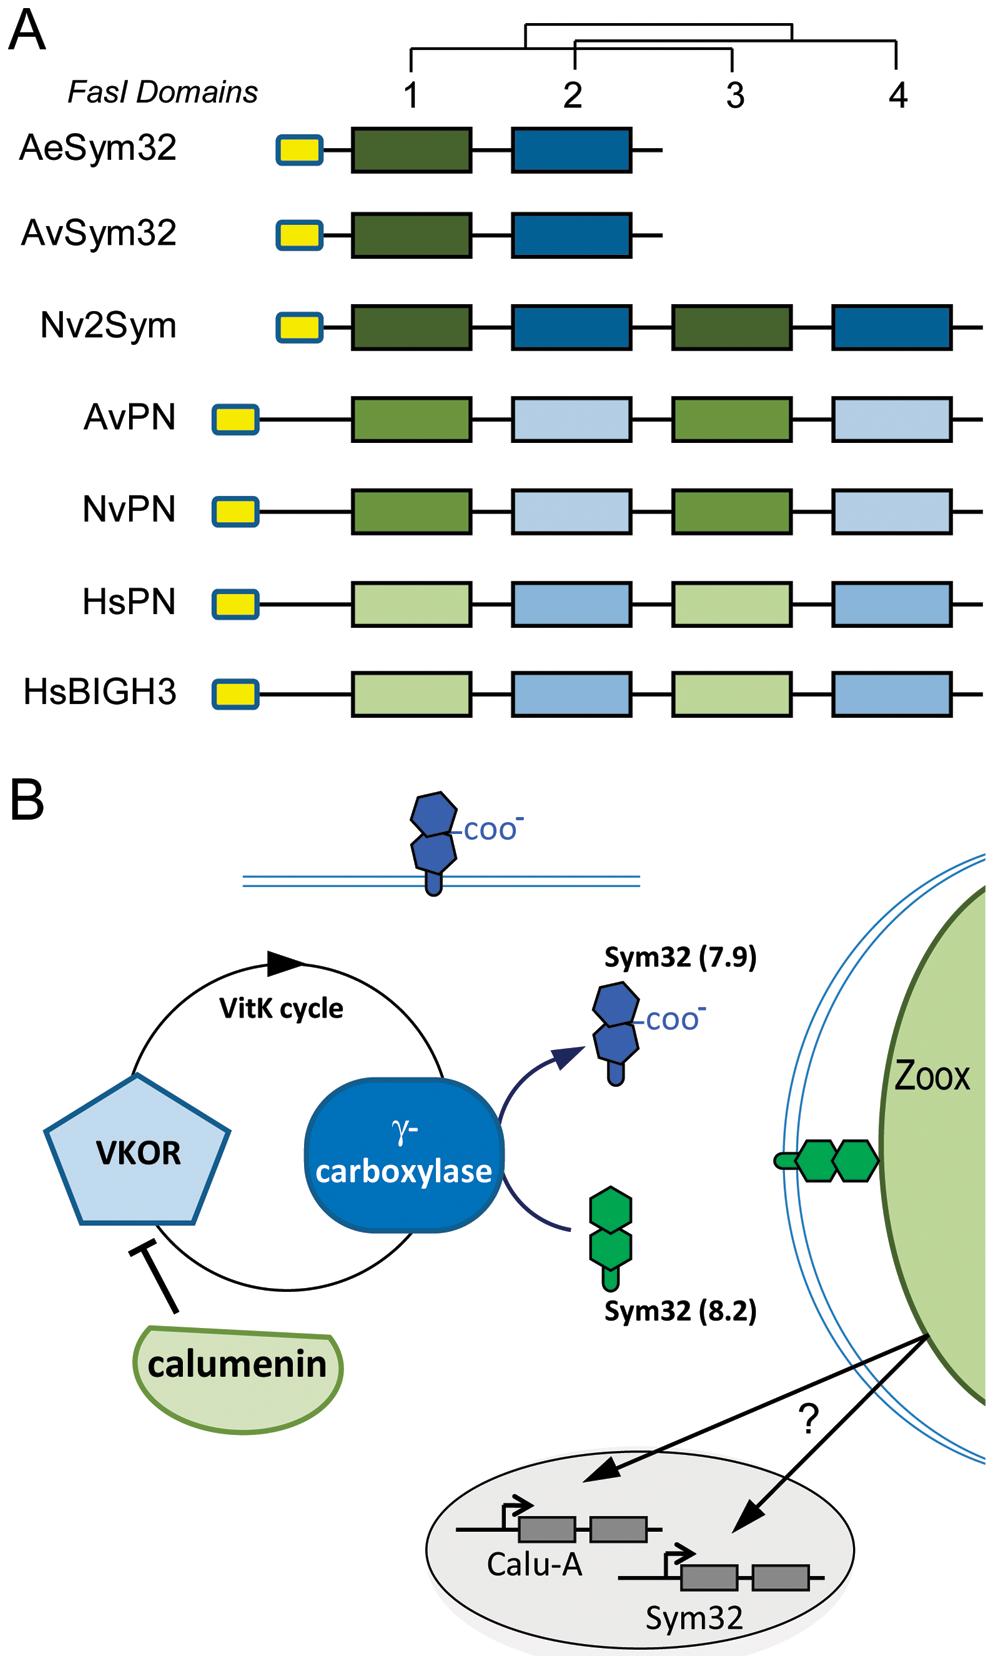 Sym32 gene duplication and putative γ-carboxylation regulation model.